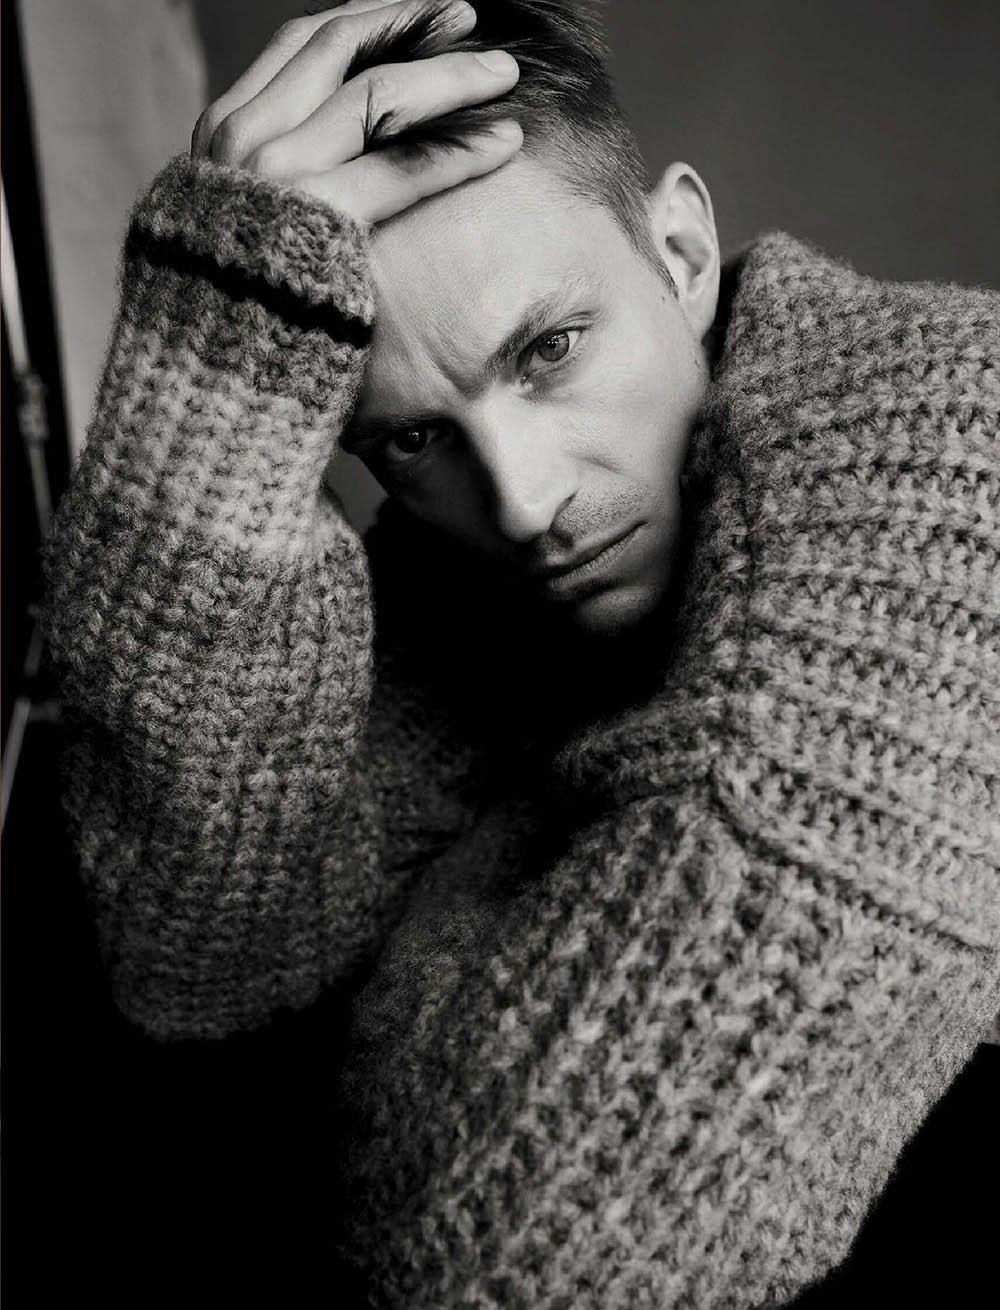 Joel Kinnaman covers L'Uomo Vogue May 2019 by Sølve Sundsbø